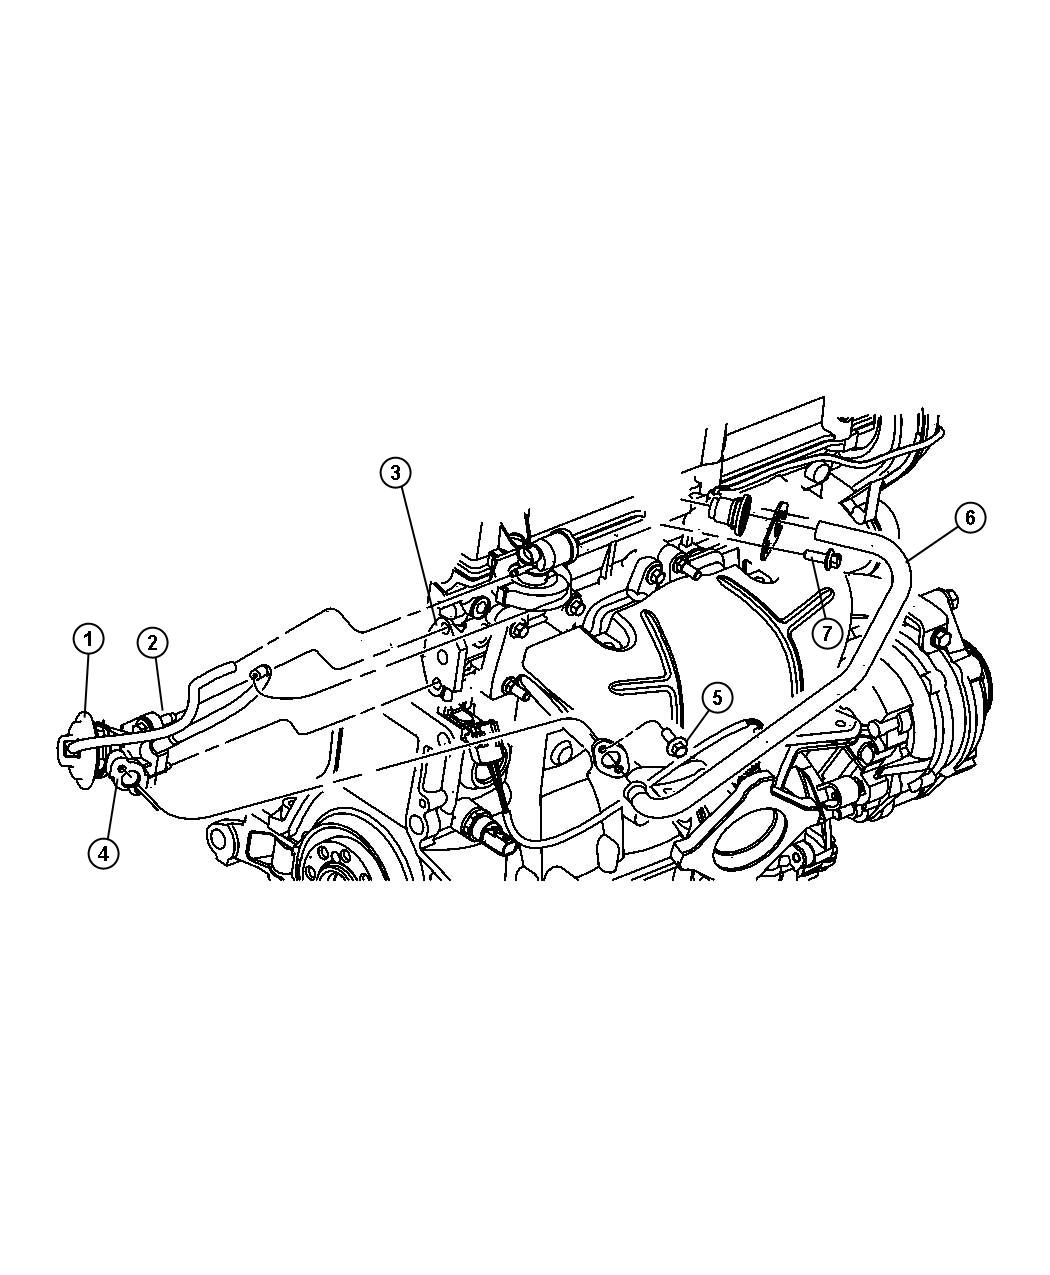 2001 pt cruiser parts accessories